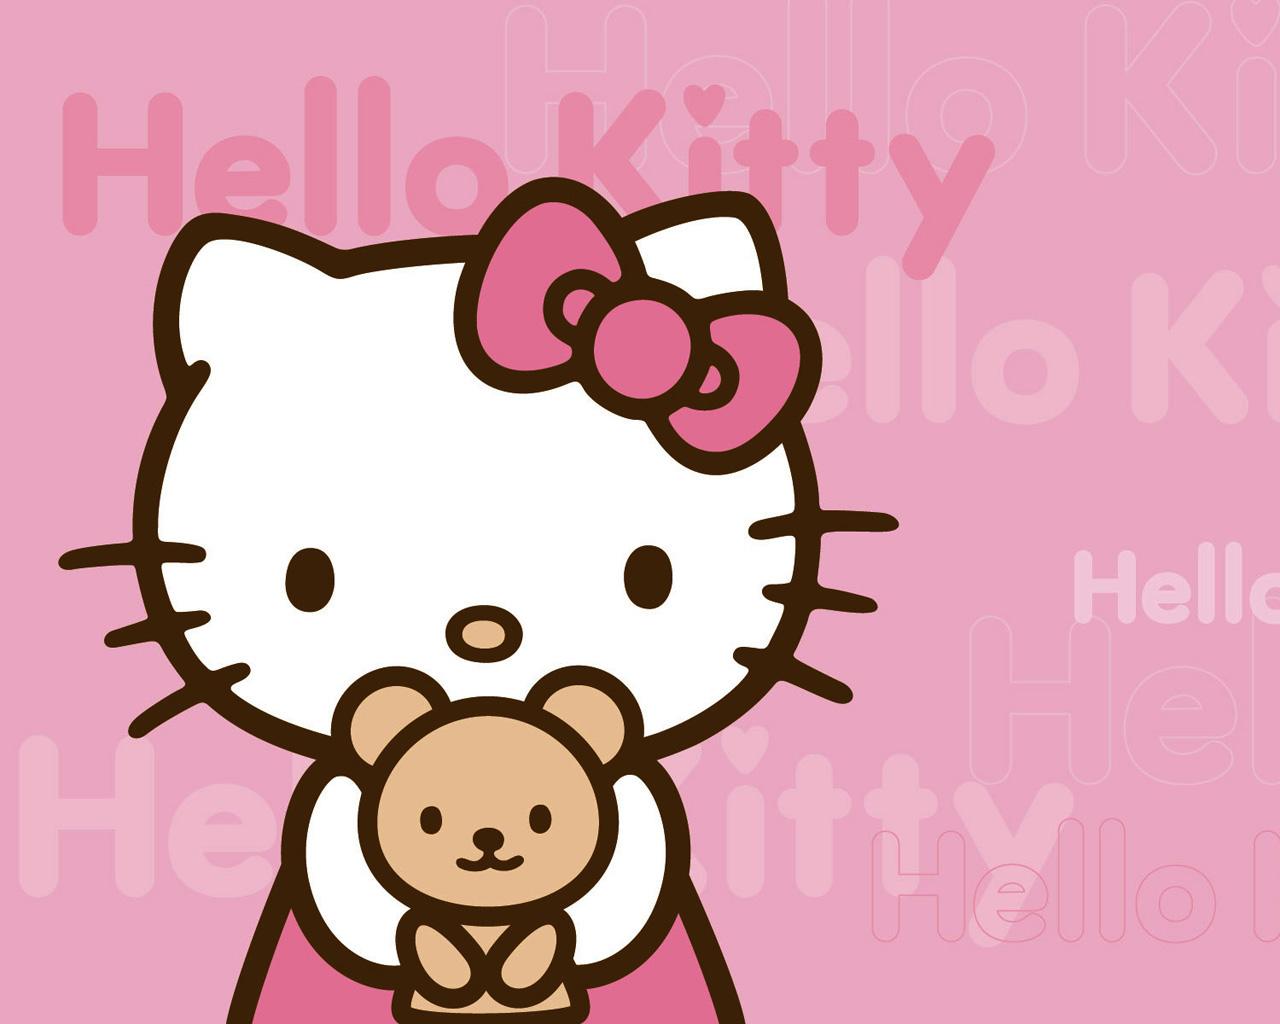 Animasi Bergerak Hello Kitty Terbaru Images Rumah Minimalis